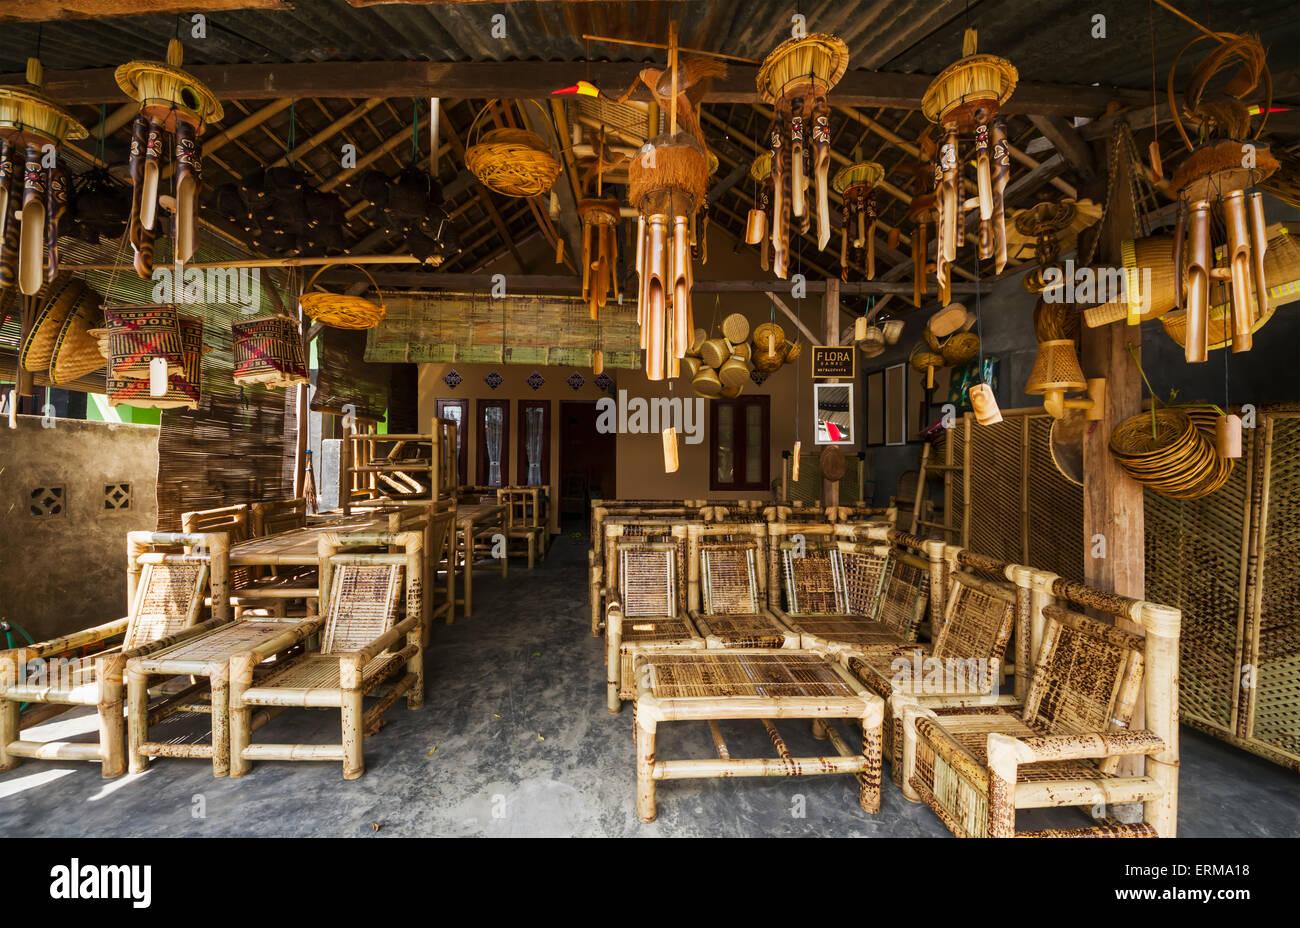 handicrafts; arts; crafts; Indonesia; Indonesian; Java; Lombok; West Nusa Tenggara; bamboo - Stock Image